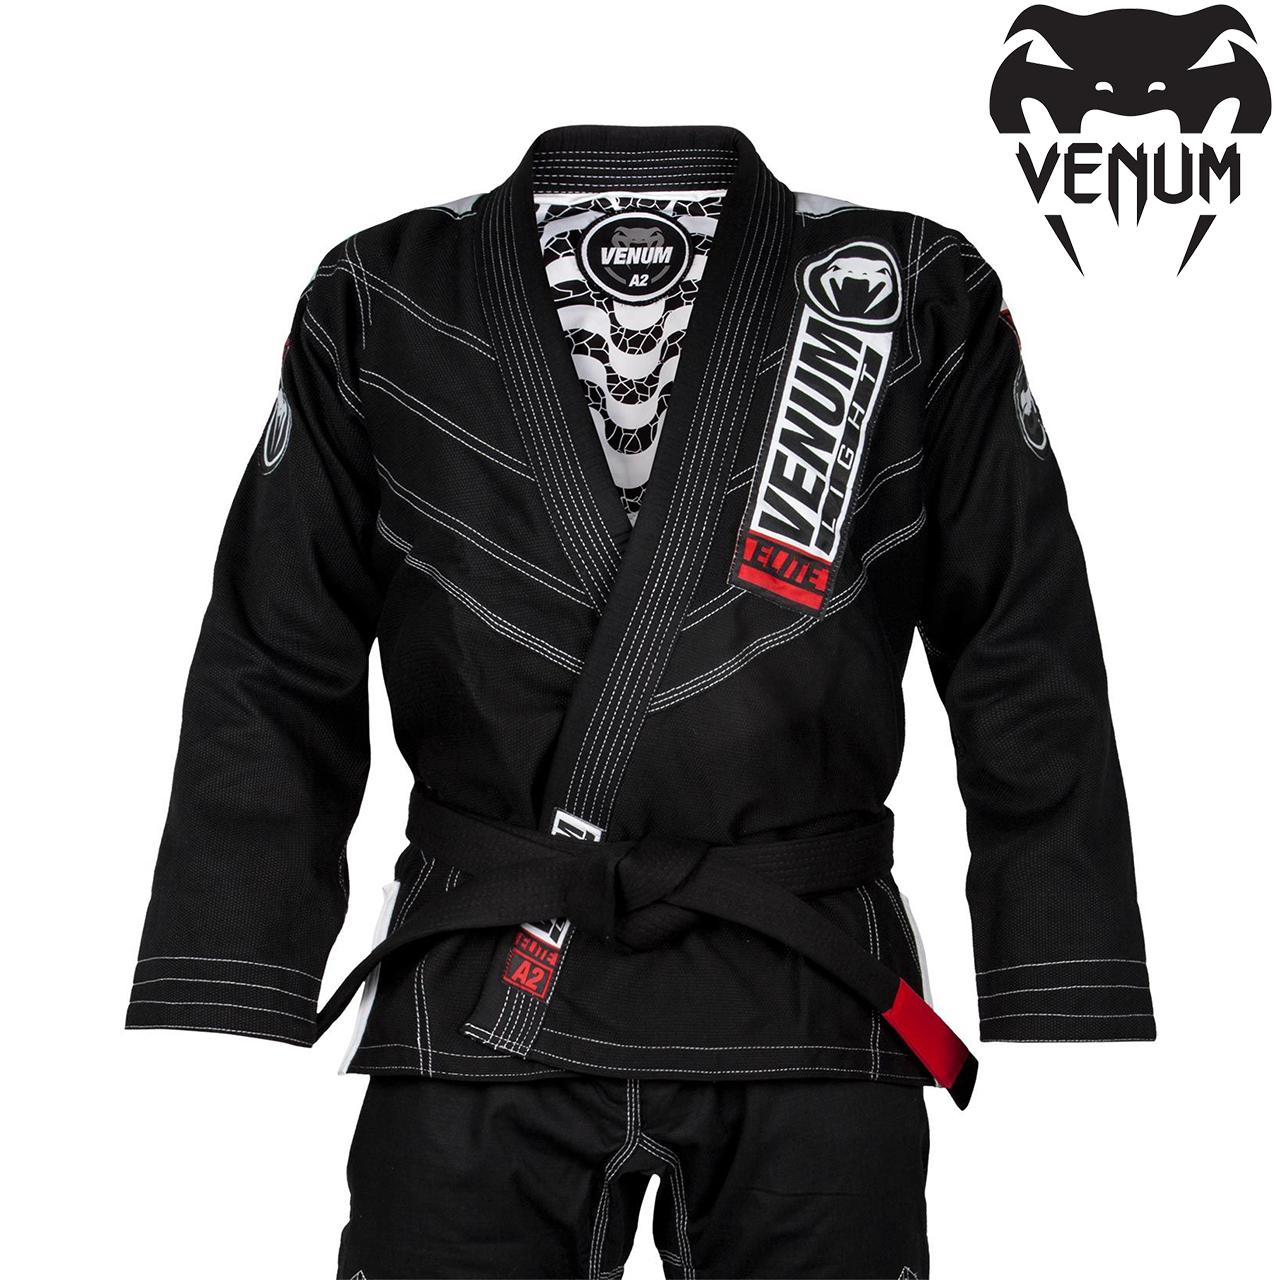 Кимоно для джиу-джитсу Venum Elite Light 2.0 BJJ GI Black